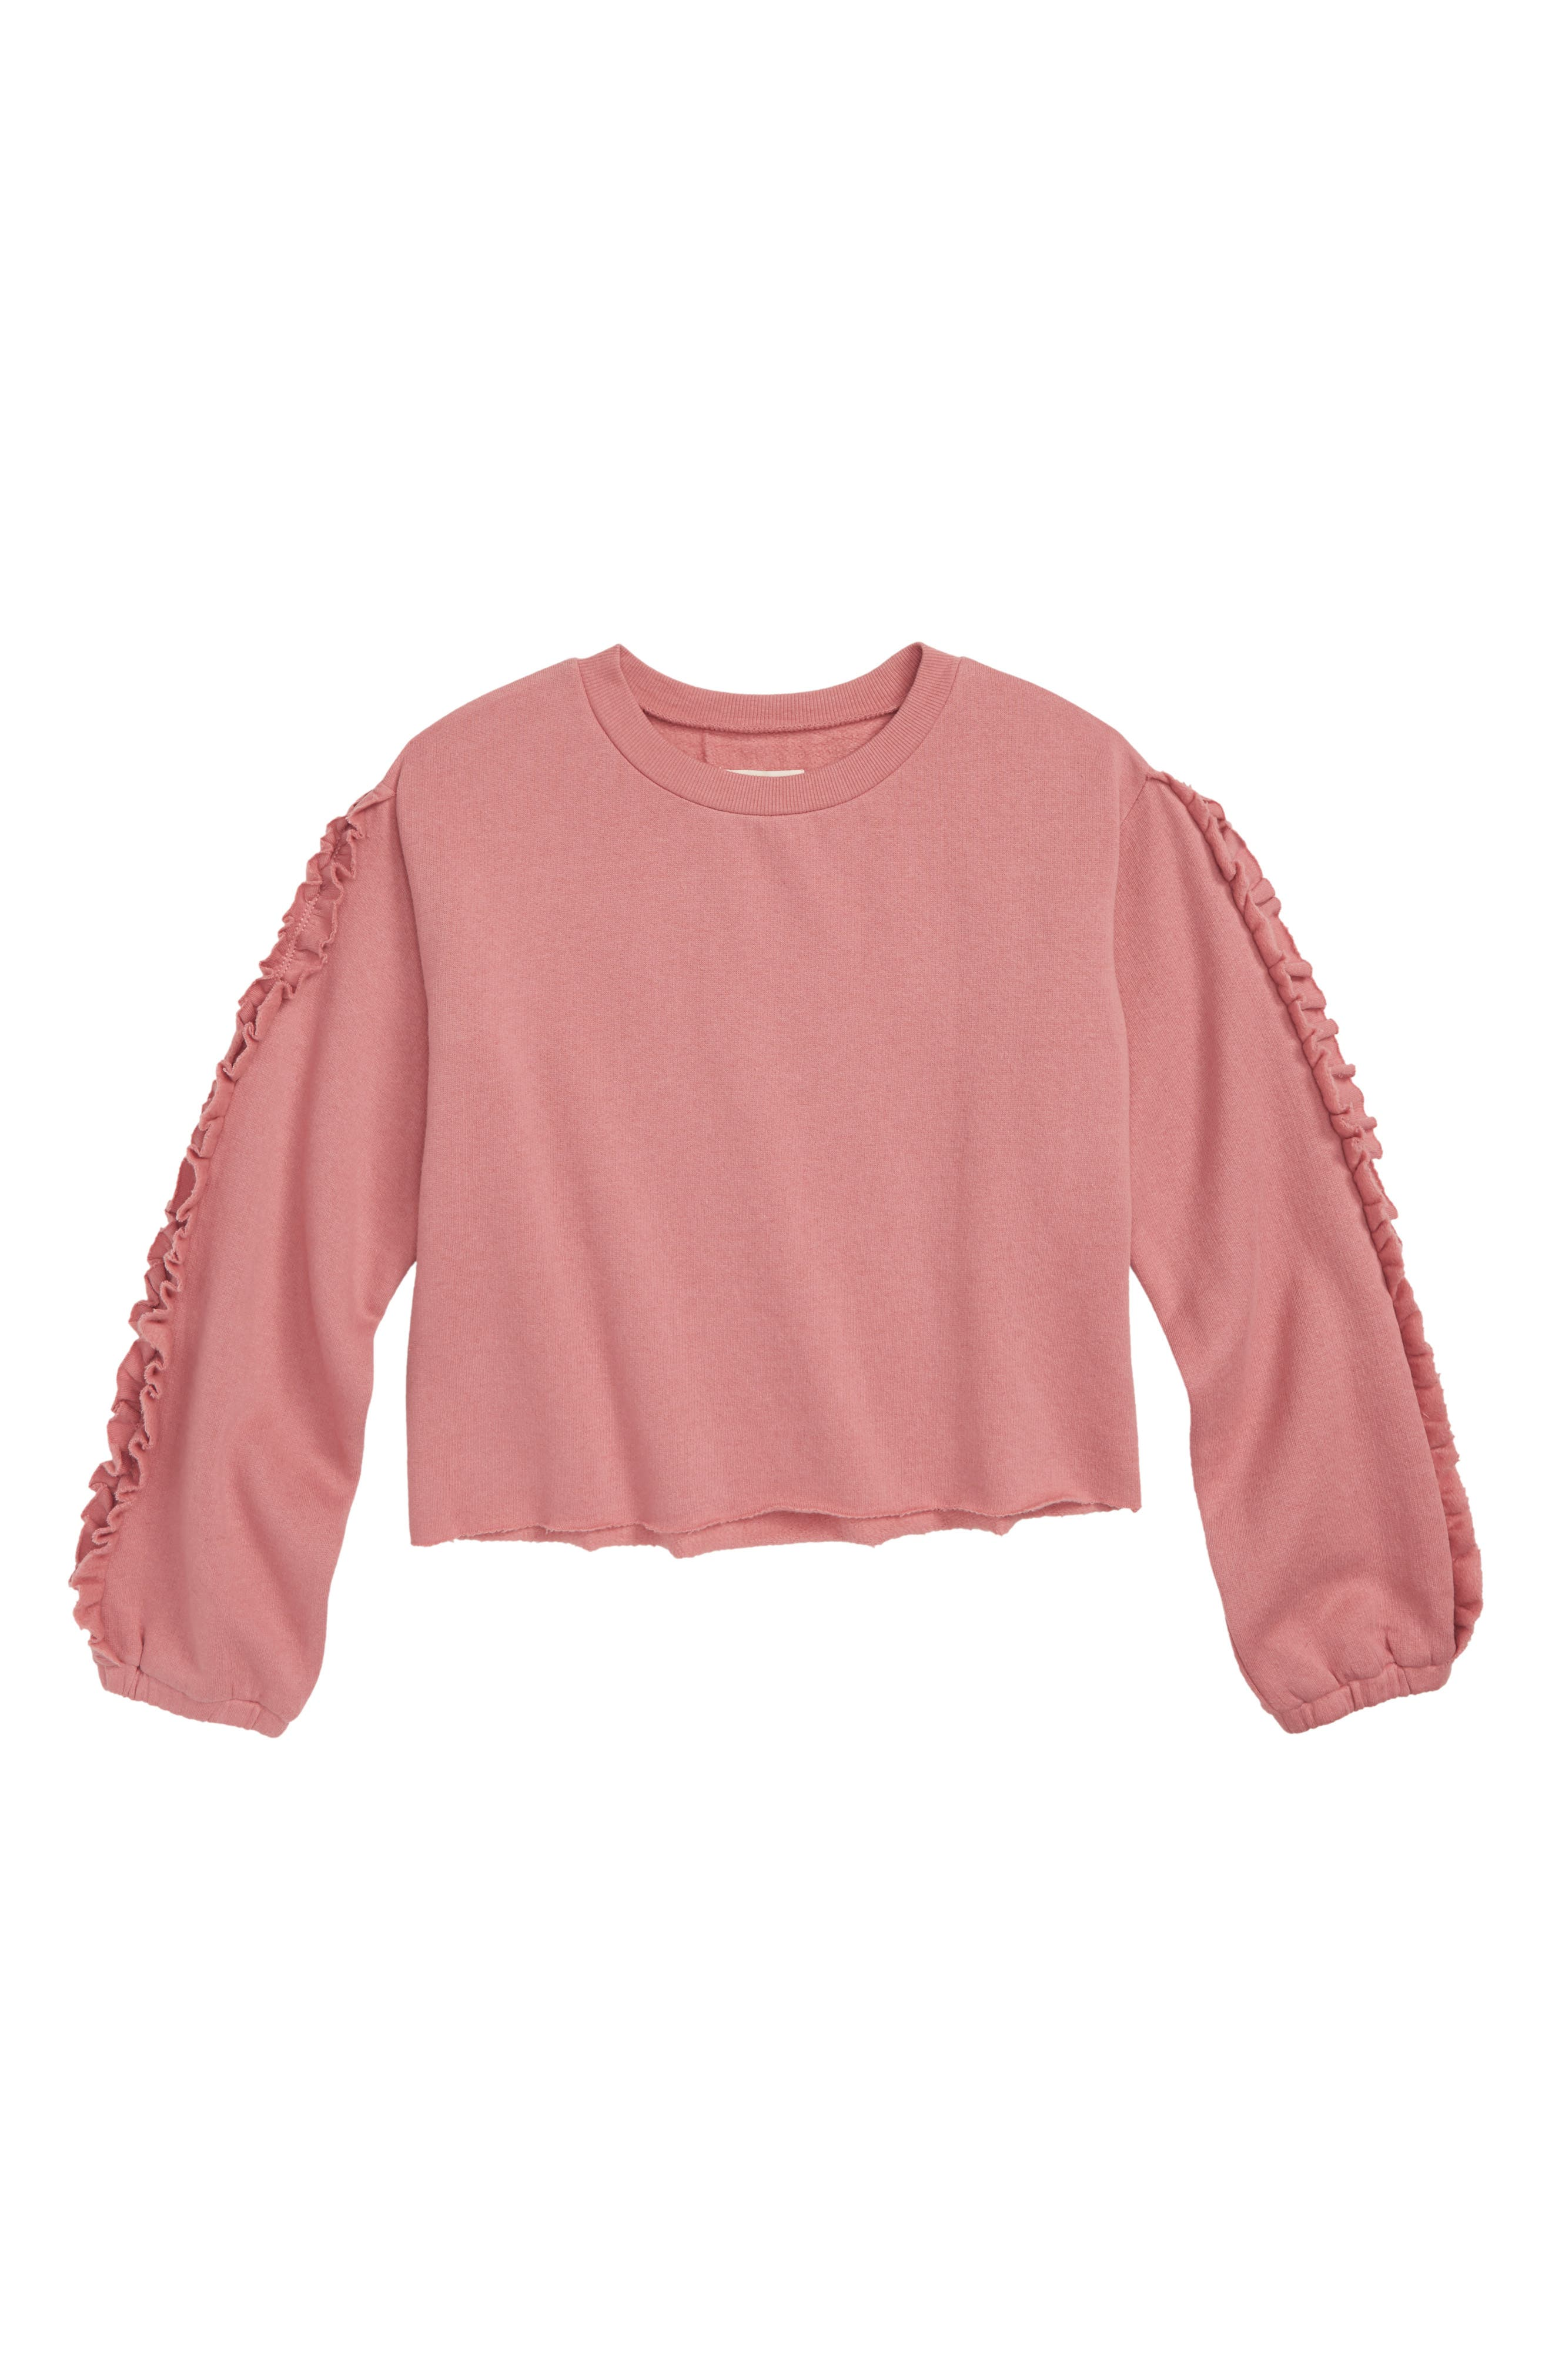 Ruffle Sleeve Sweatshirt,                             Main thumbnail 1, color,                             680